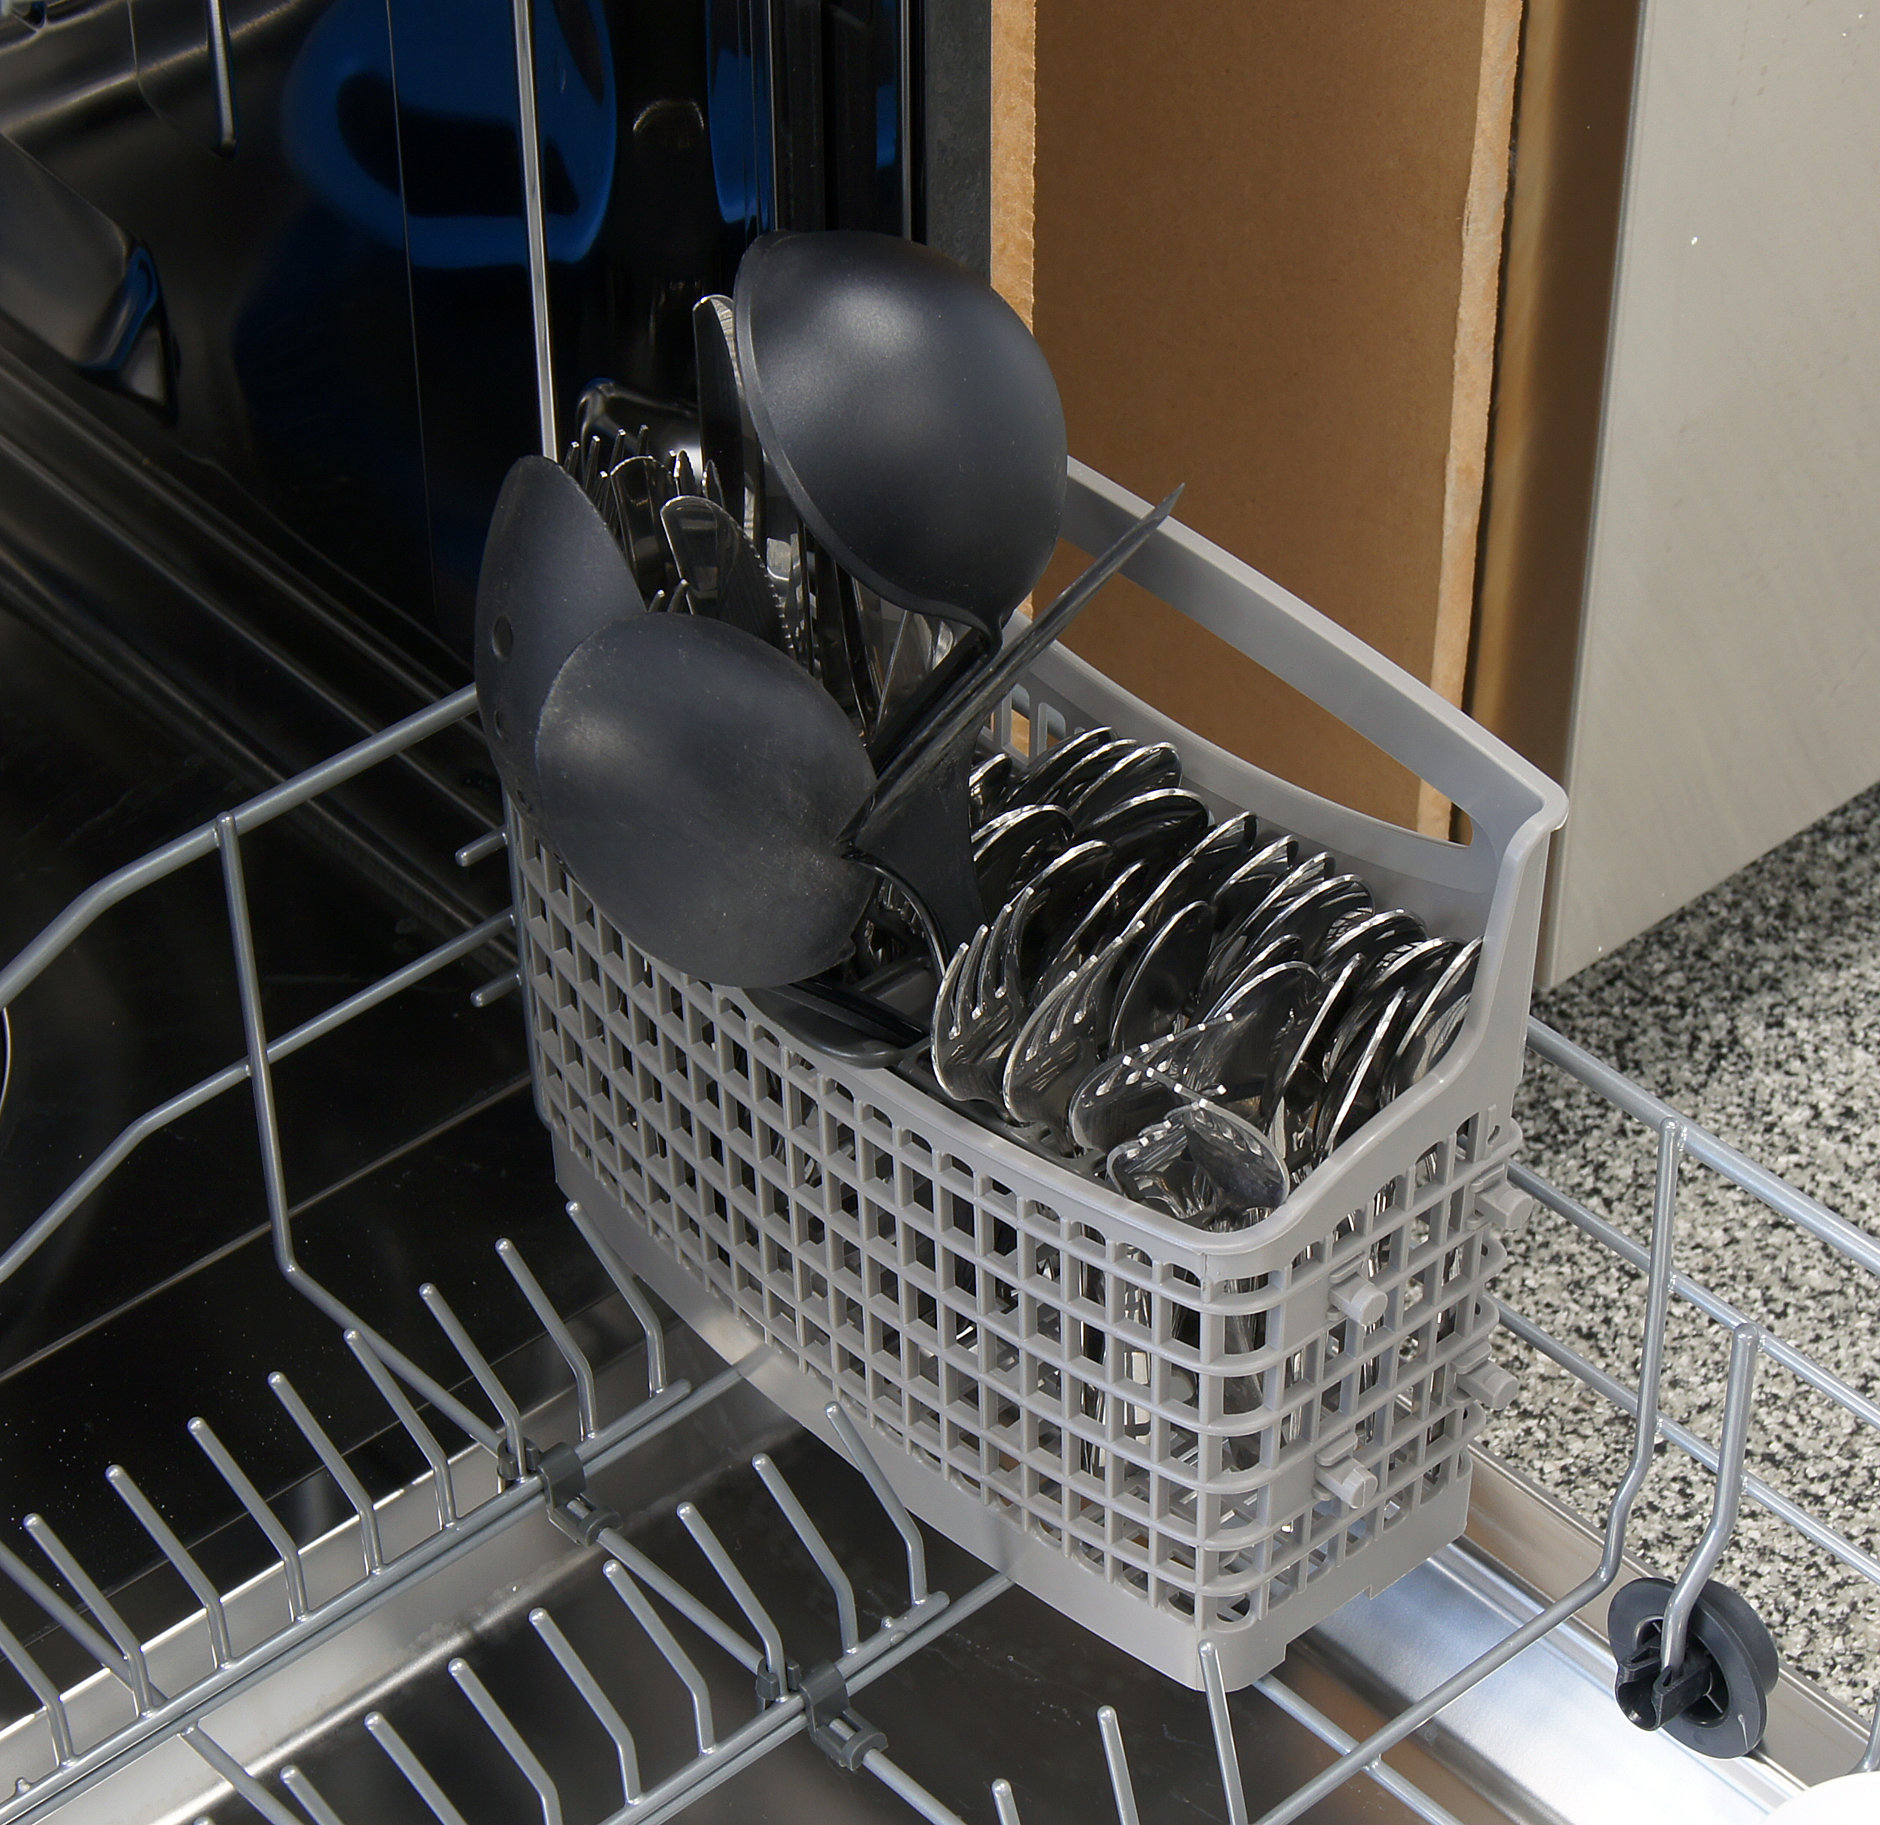 Frigidaire Gallery FGID2474QS cutlery capacity